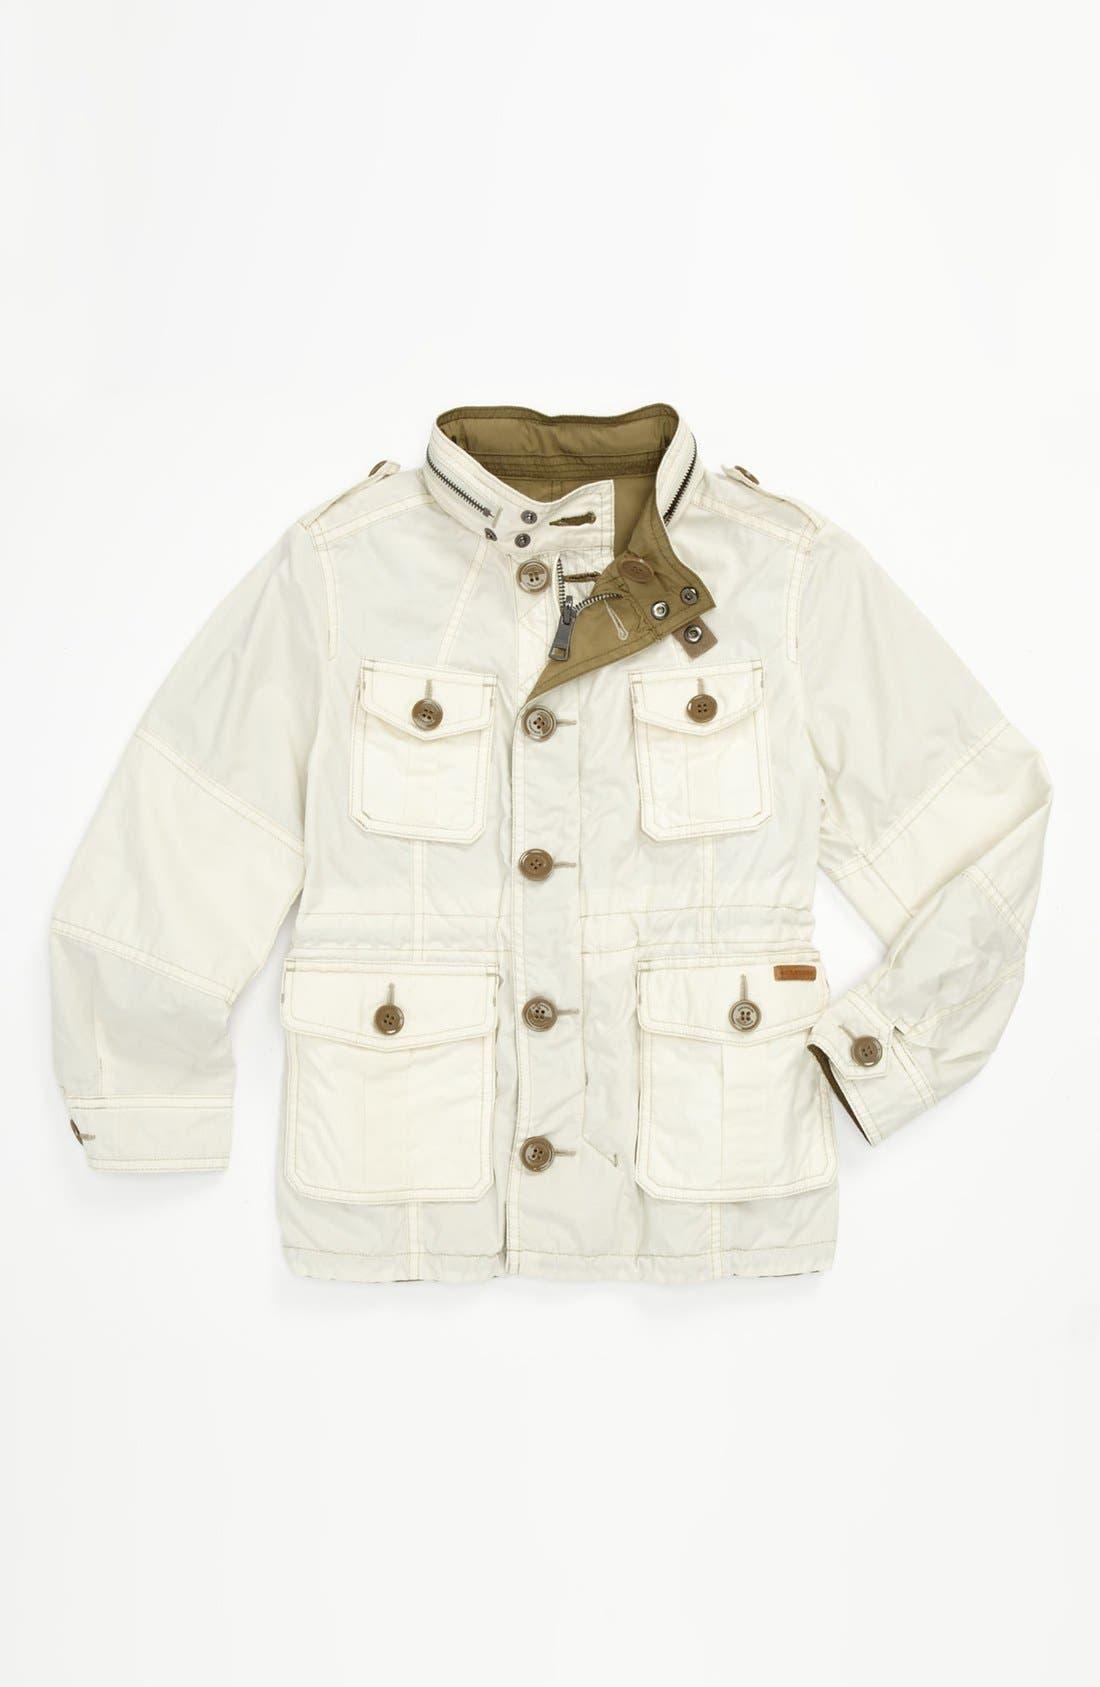 Alternate Image 1 Selected - Burberry 'Belfont' Reversible Jacket (Little Boys & Big Boys)